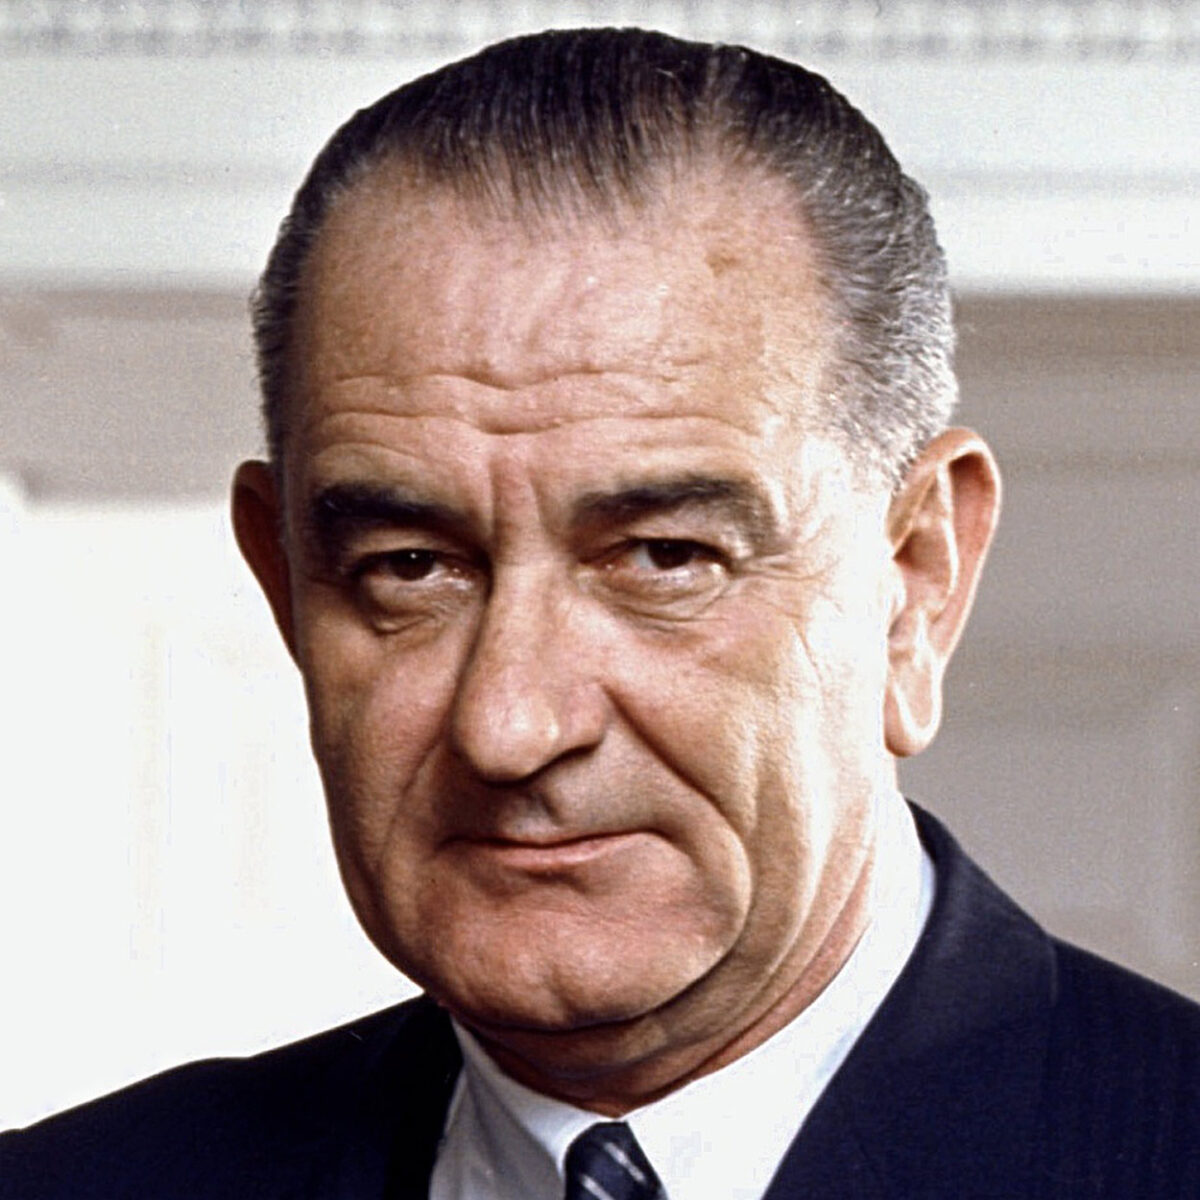 36th President of The United States Lyndon B Johnson